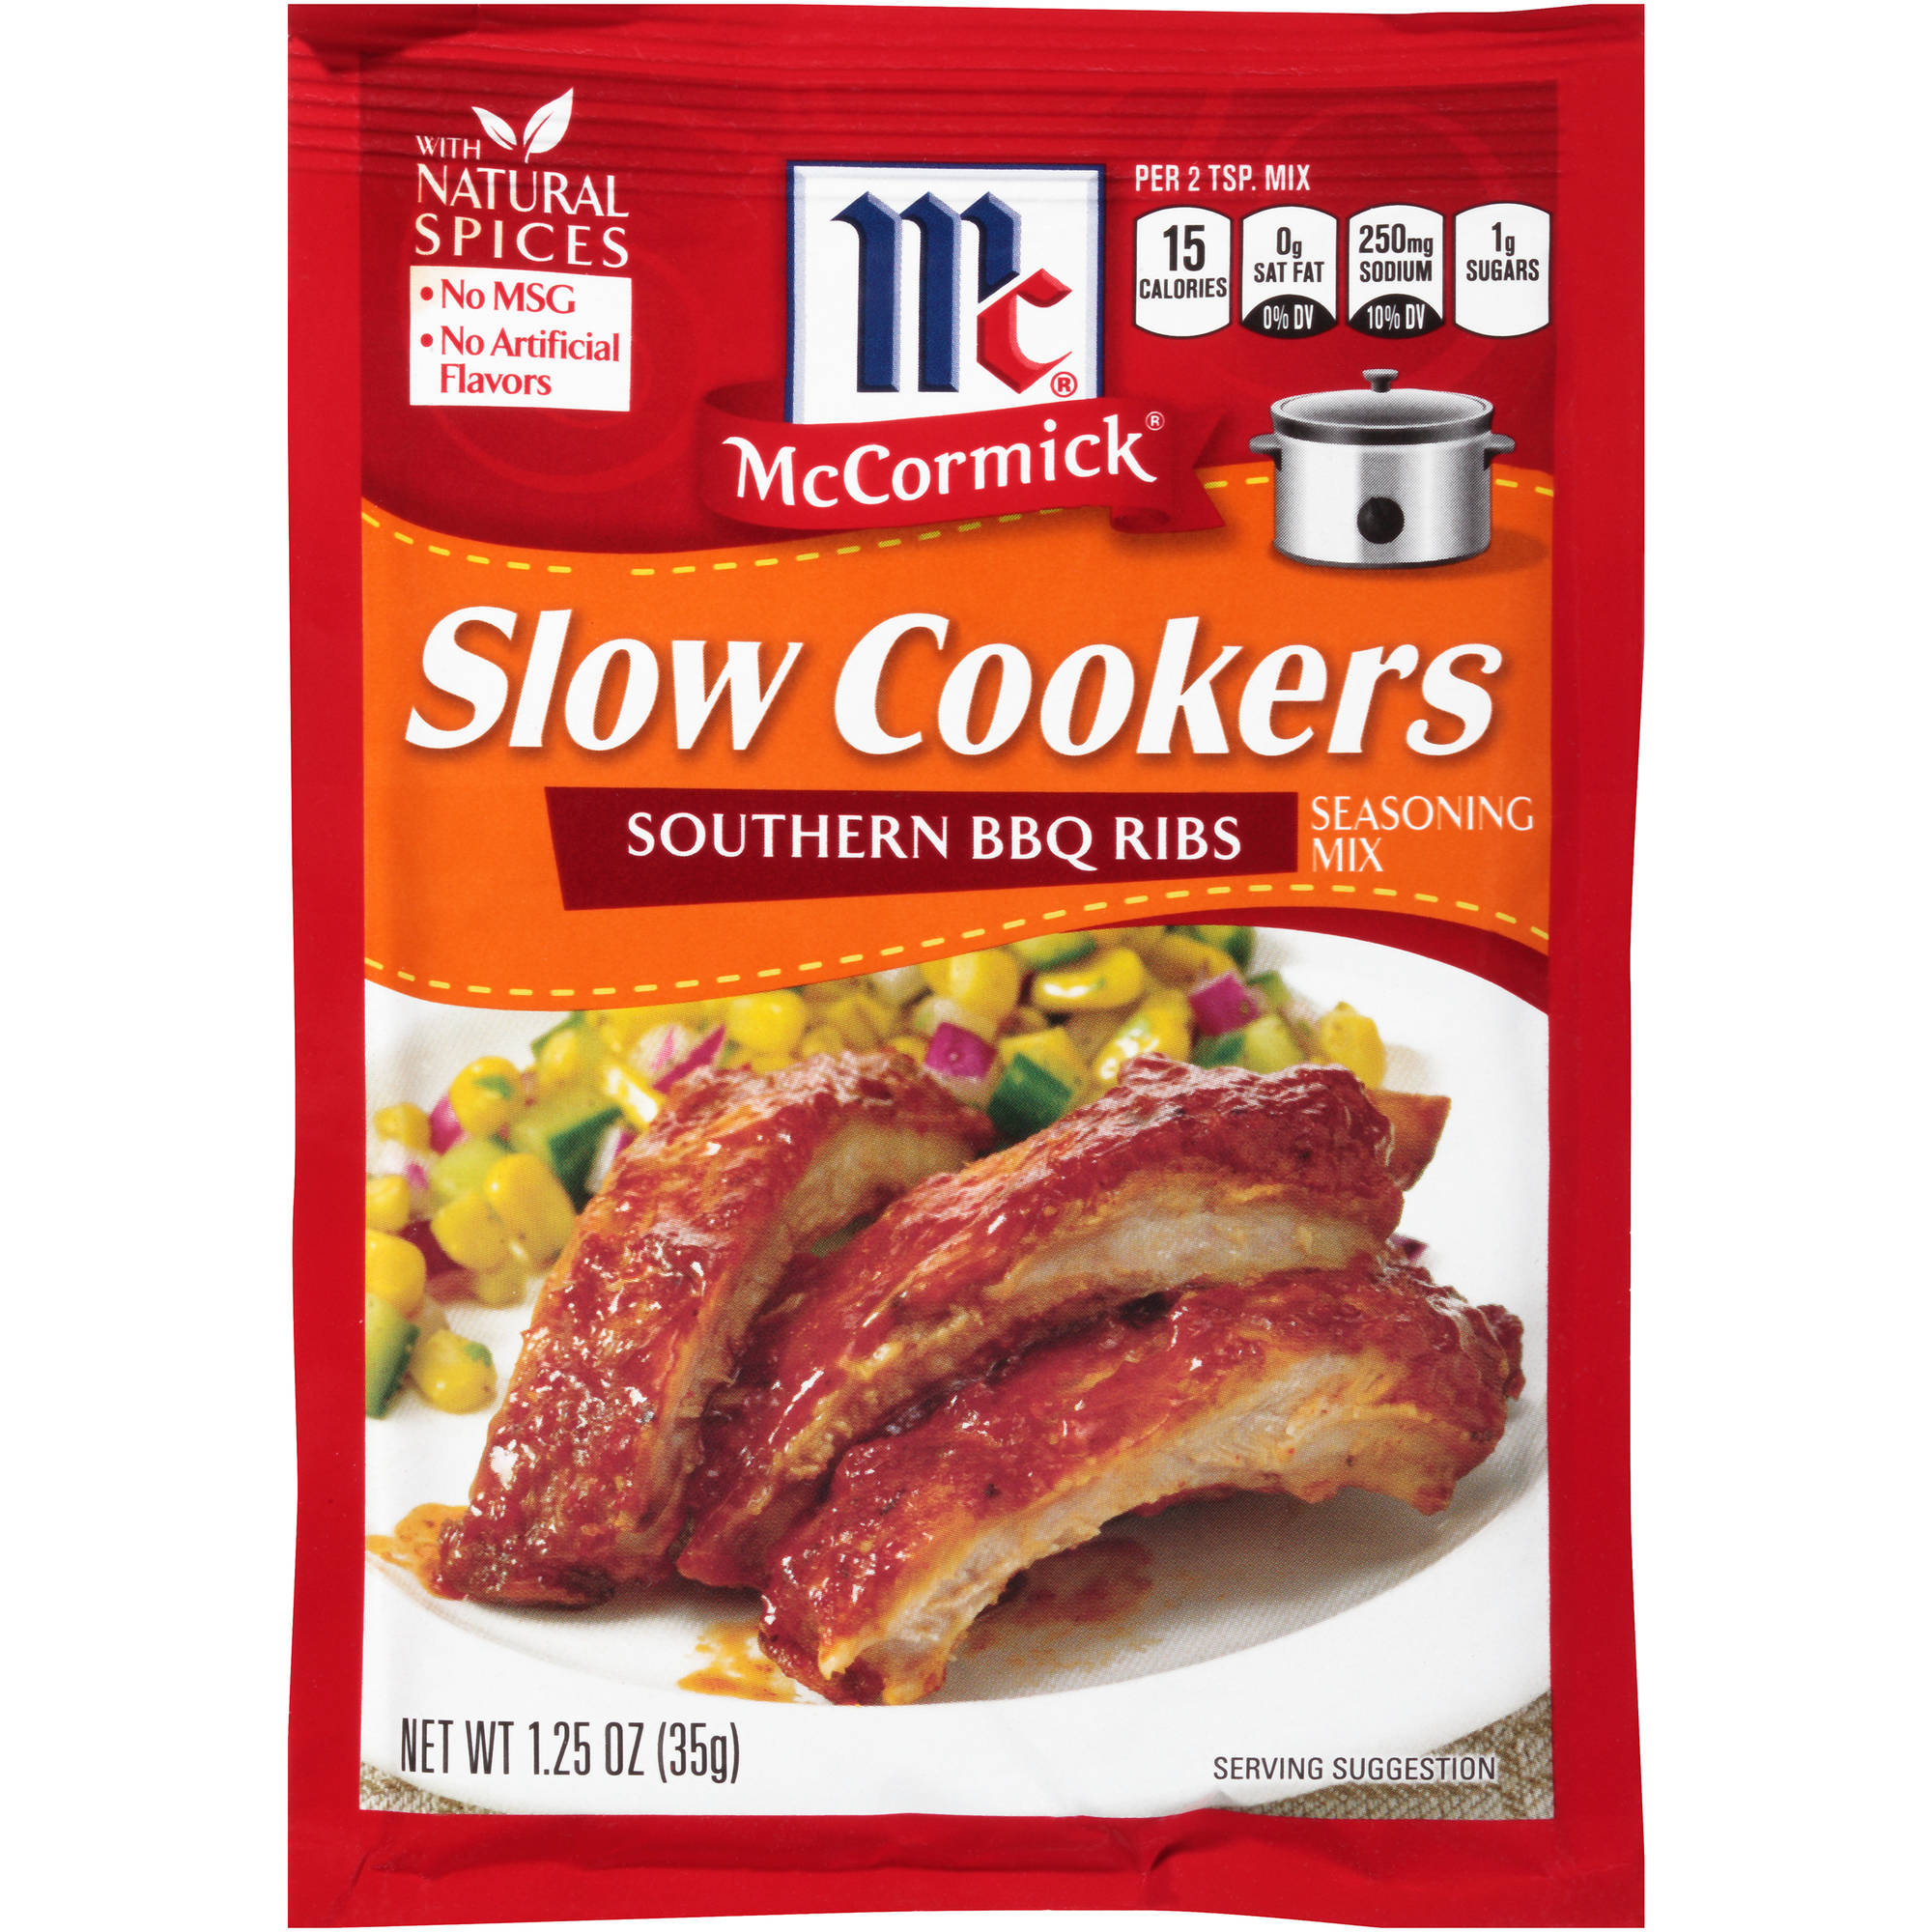 McCormick Slow Cookers Southern BBQ Ribs Seasoning Mix, 1.25 oz